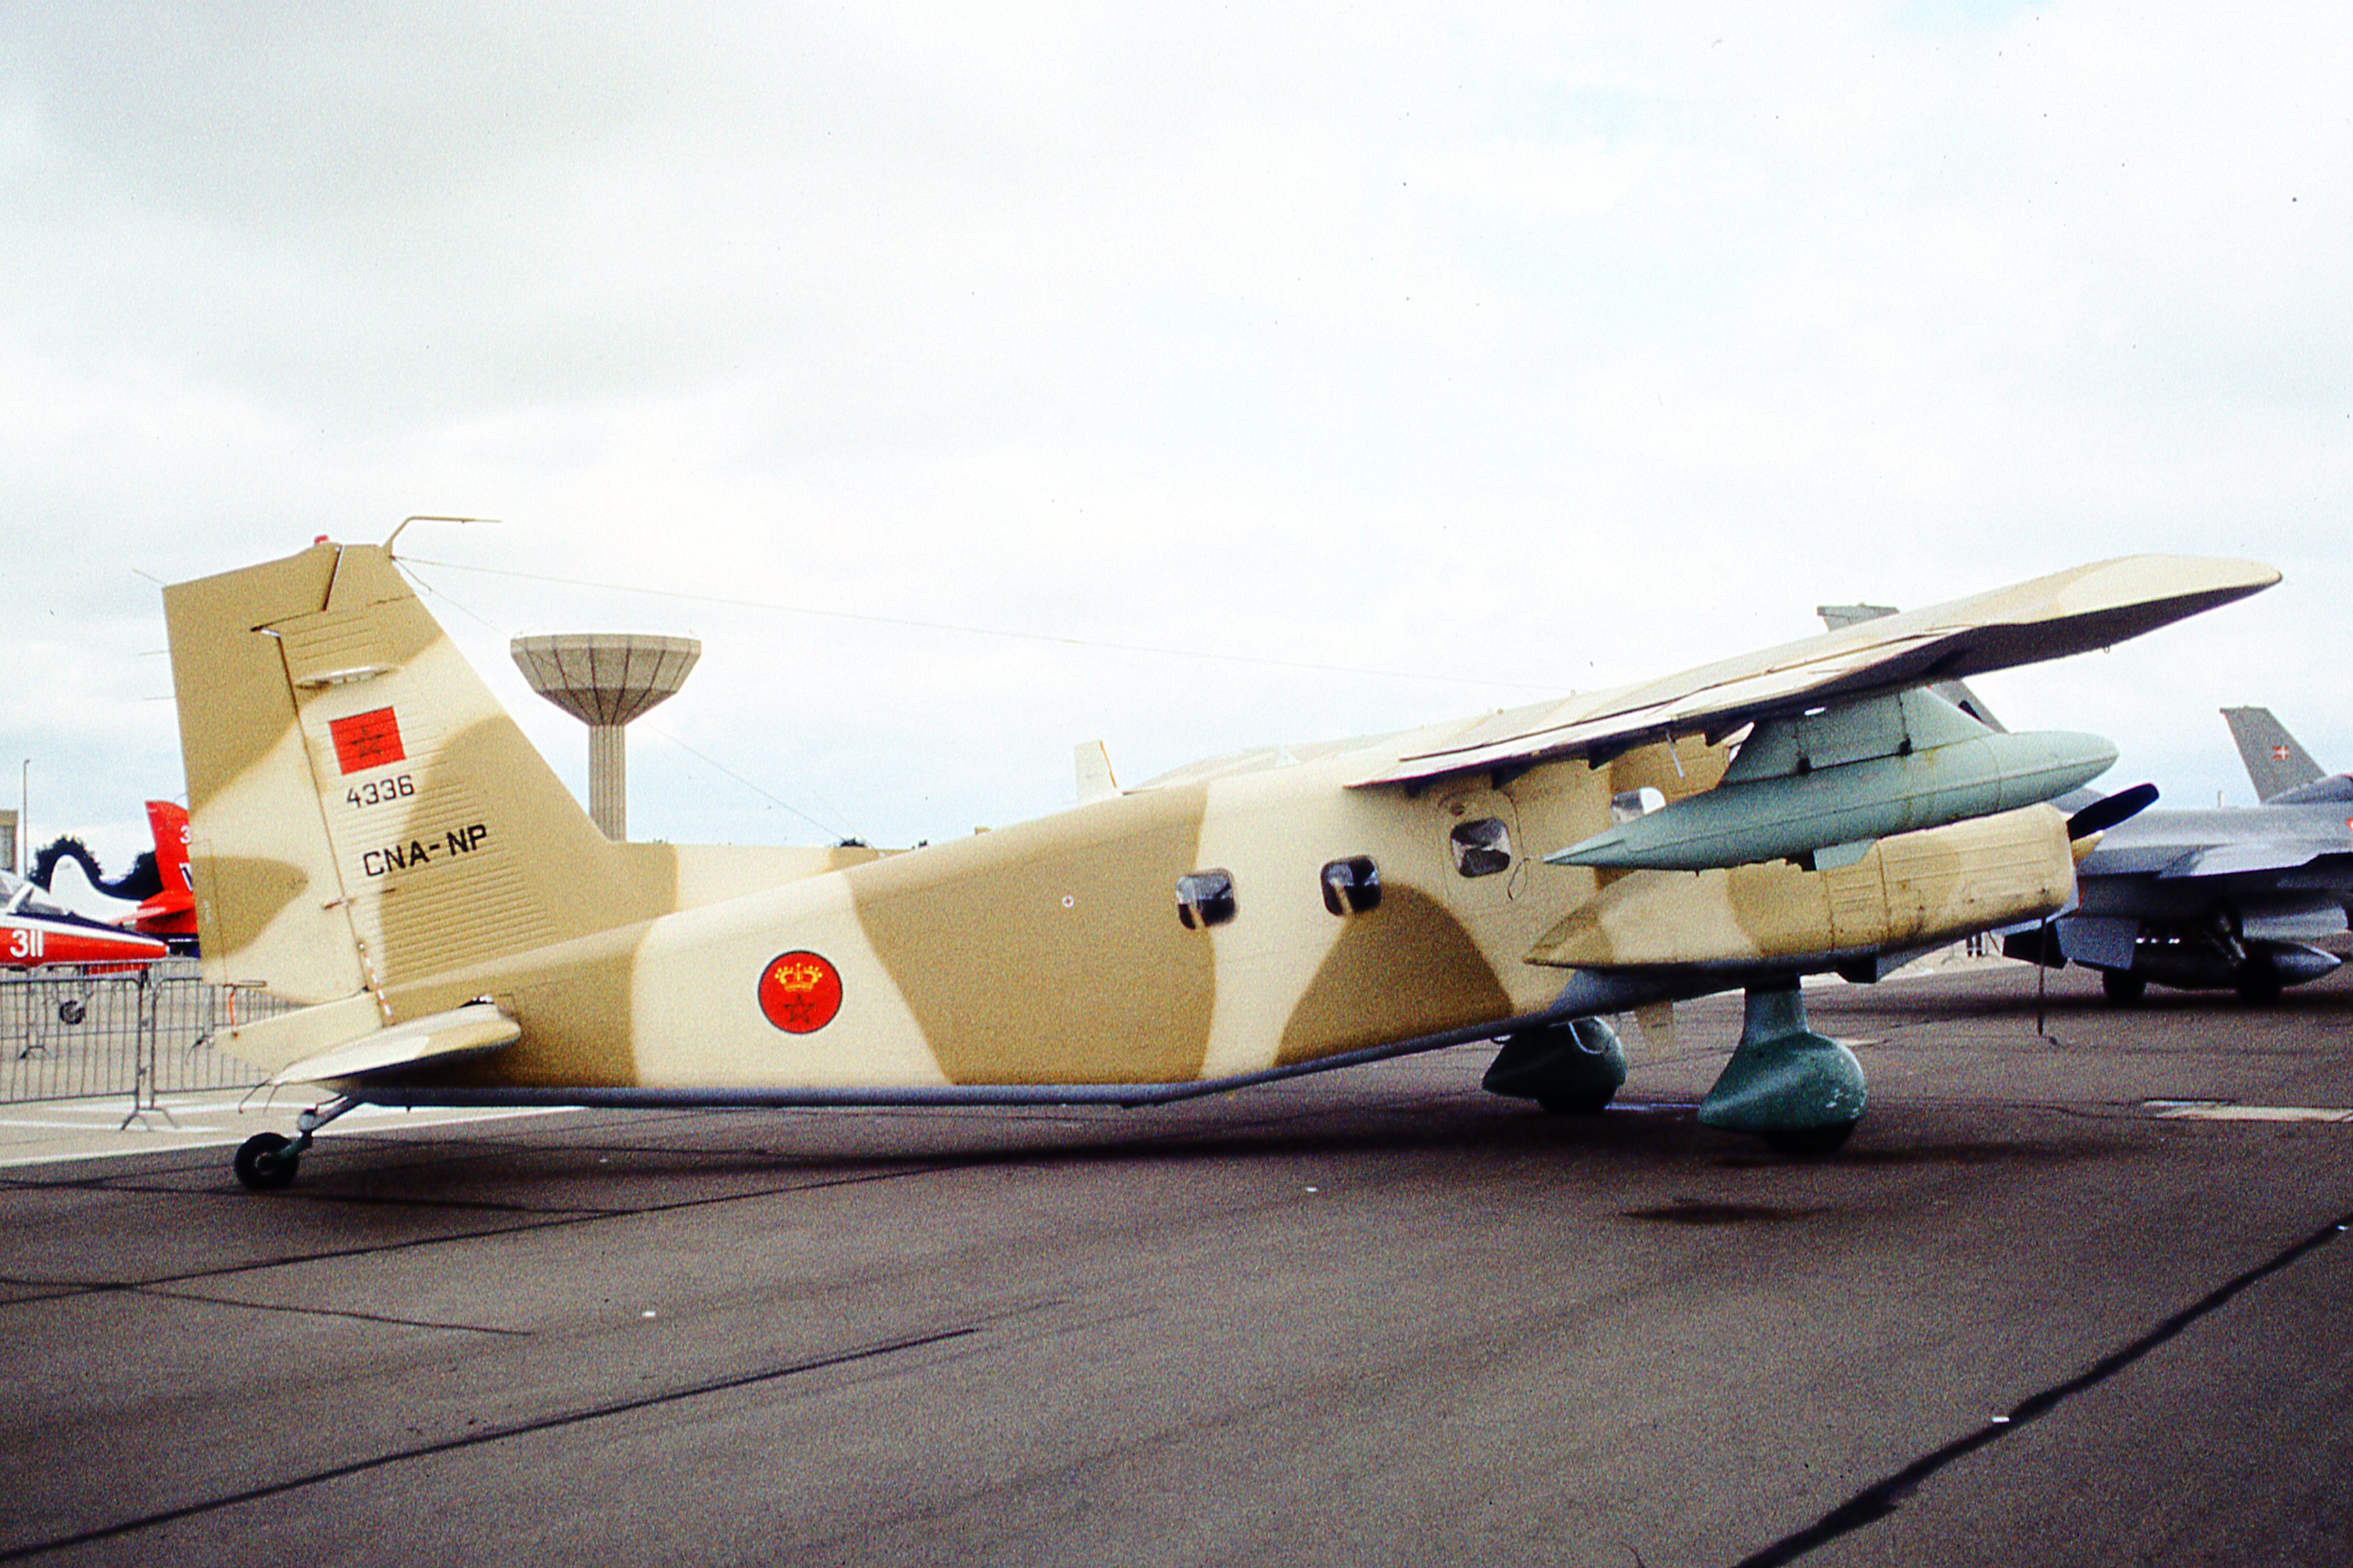 FRA: Photos anciens avions des FRA - Page 13 49852902727_47d1715fec_4k